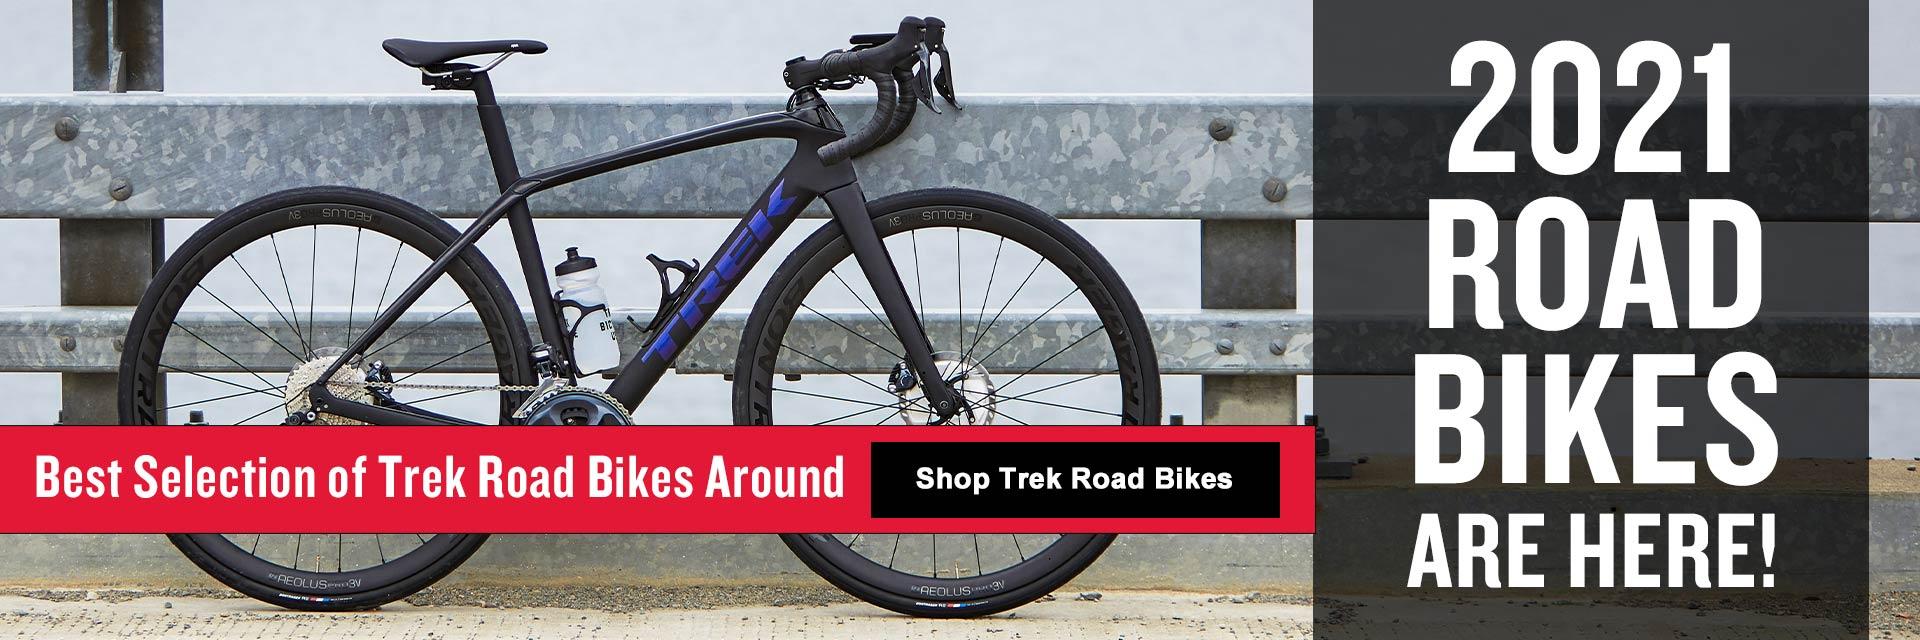 Best selection of Trek road bikes around. Shop Trek road bikes